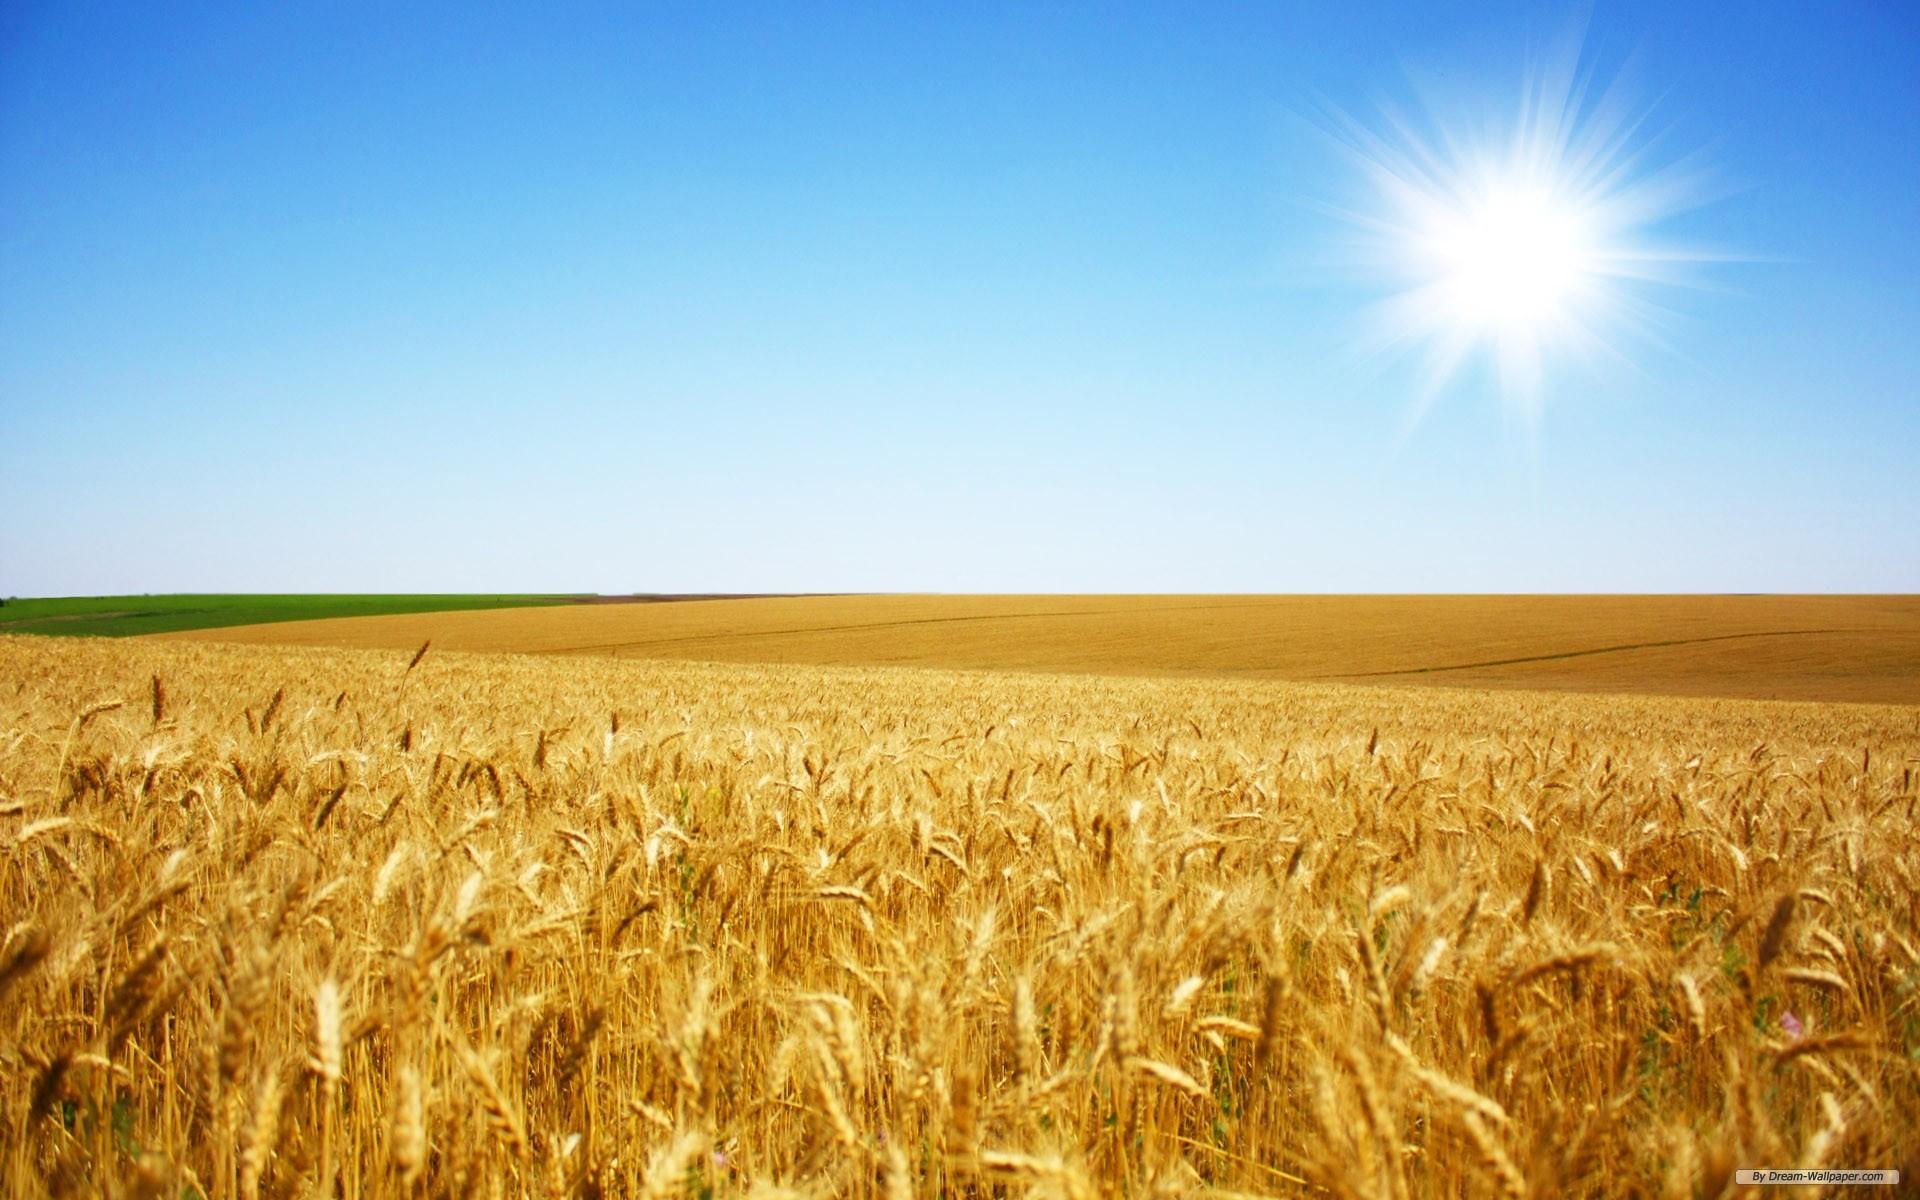 wallpaper – Wheat Field 1 wallpaper – wallpaper – Index 1 .